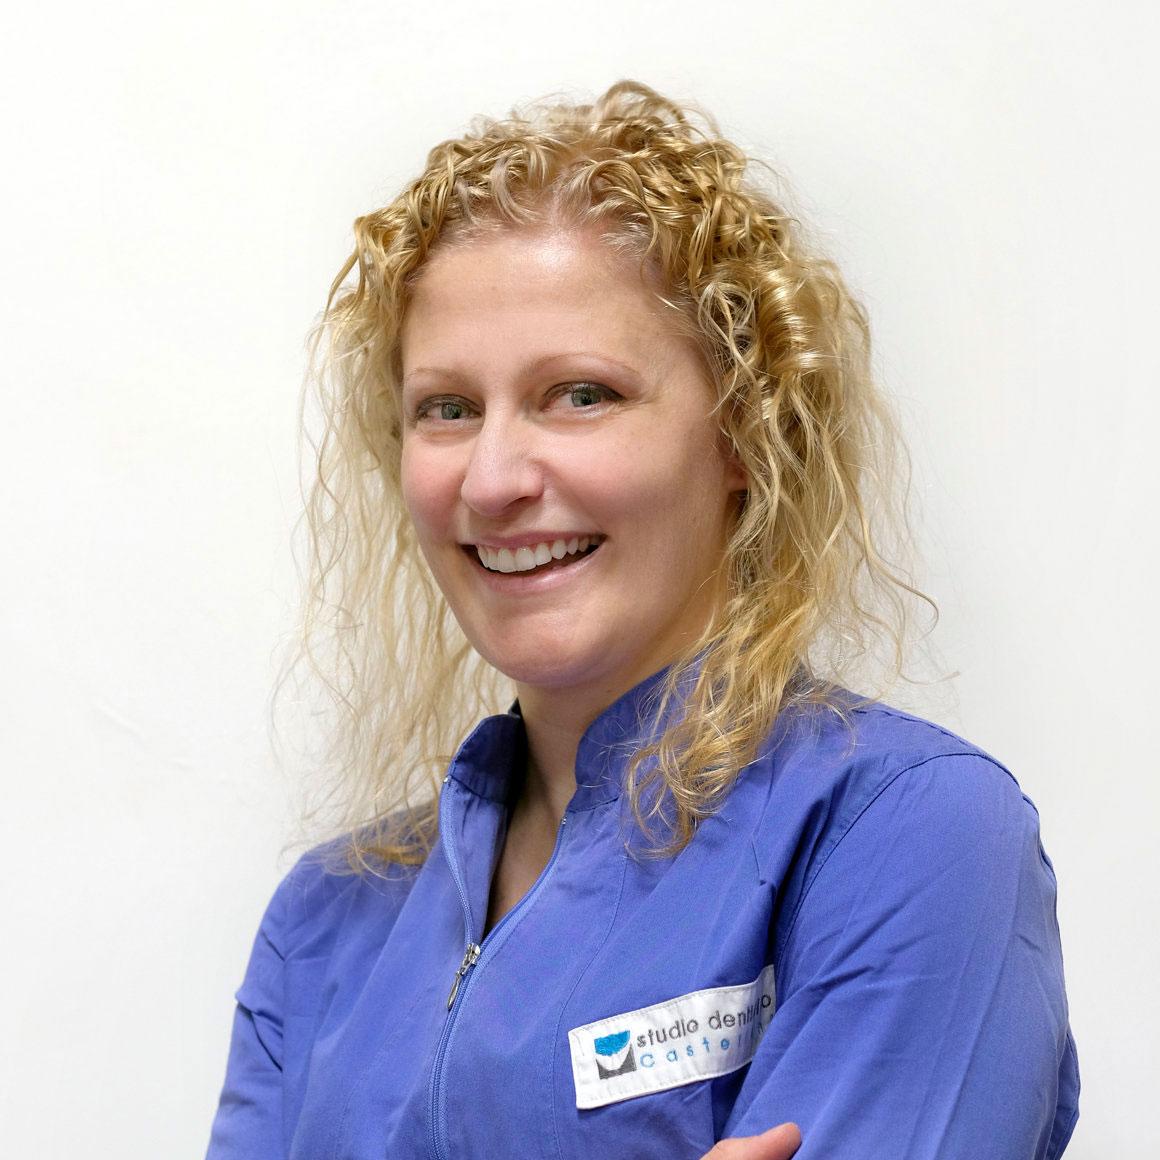 Dott.ssa Francesca Di Lorito